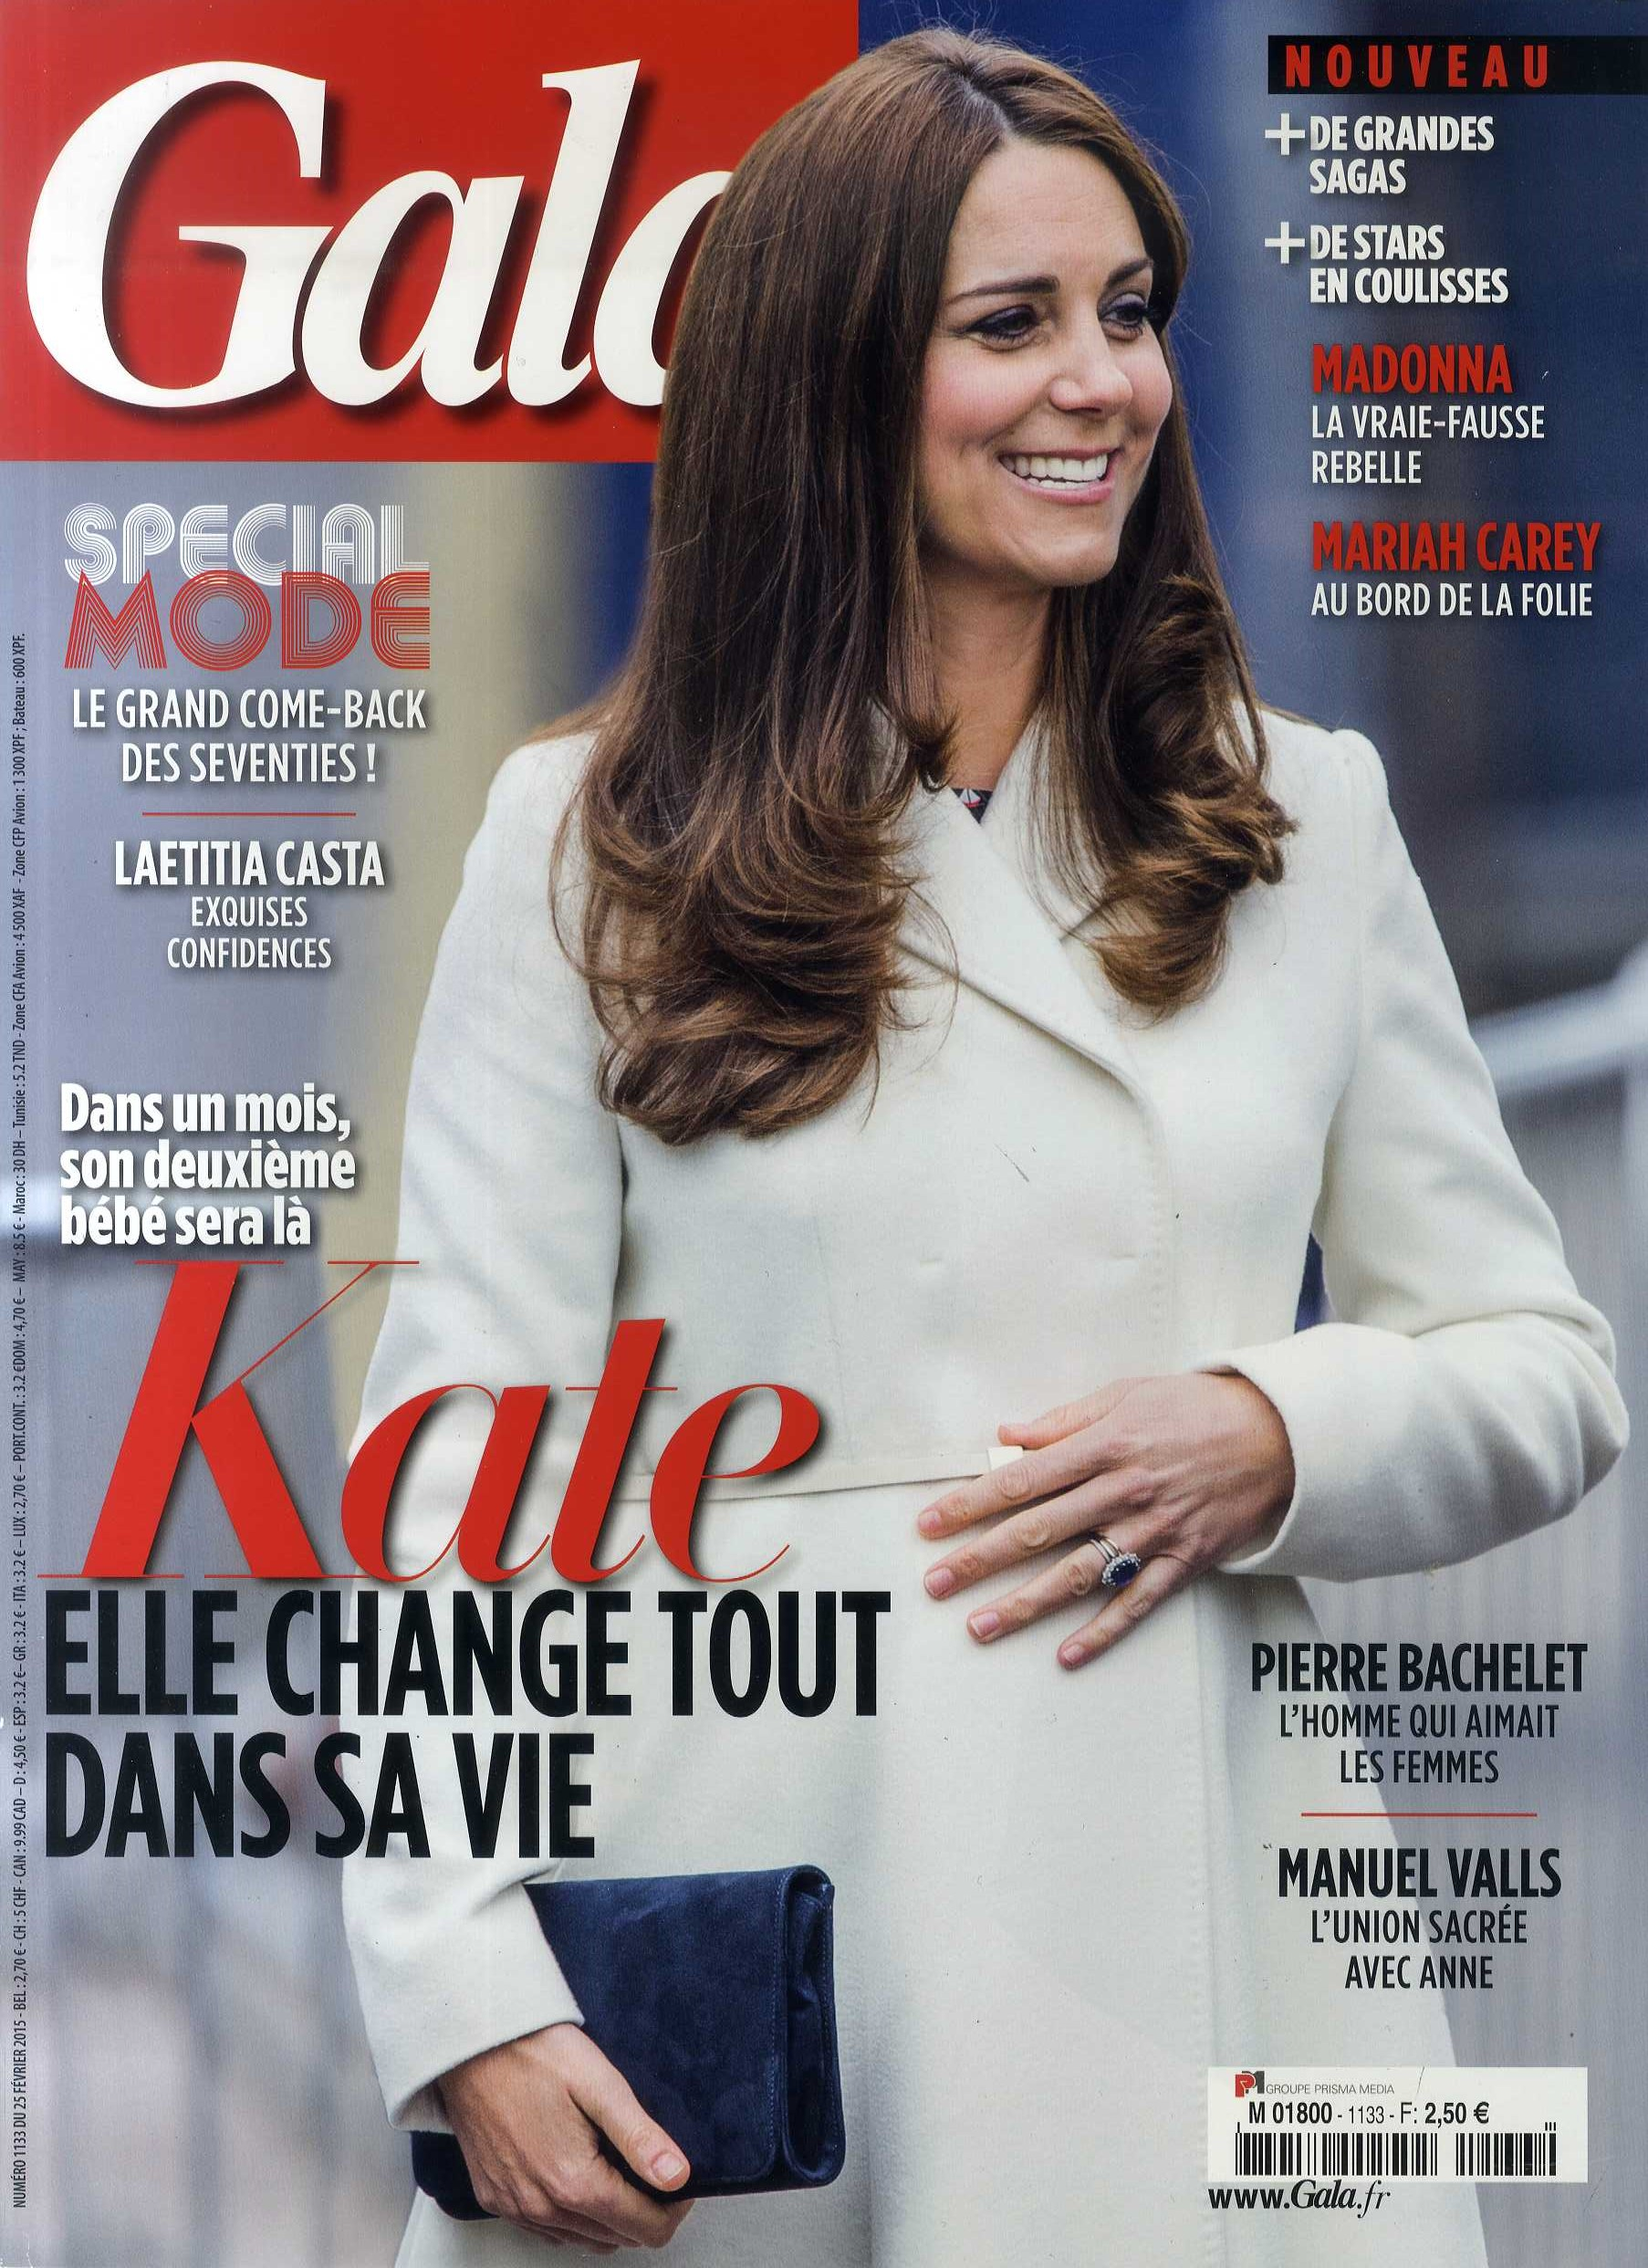 GALA 25 février 2015 Cover - clara jasmine